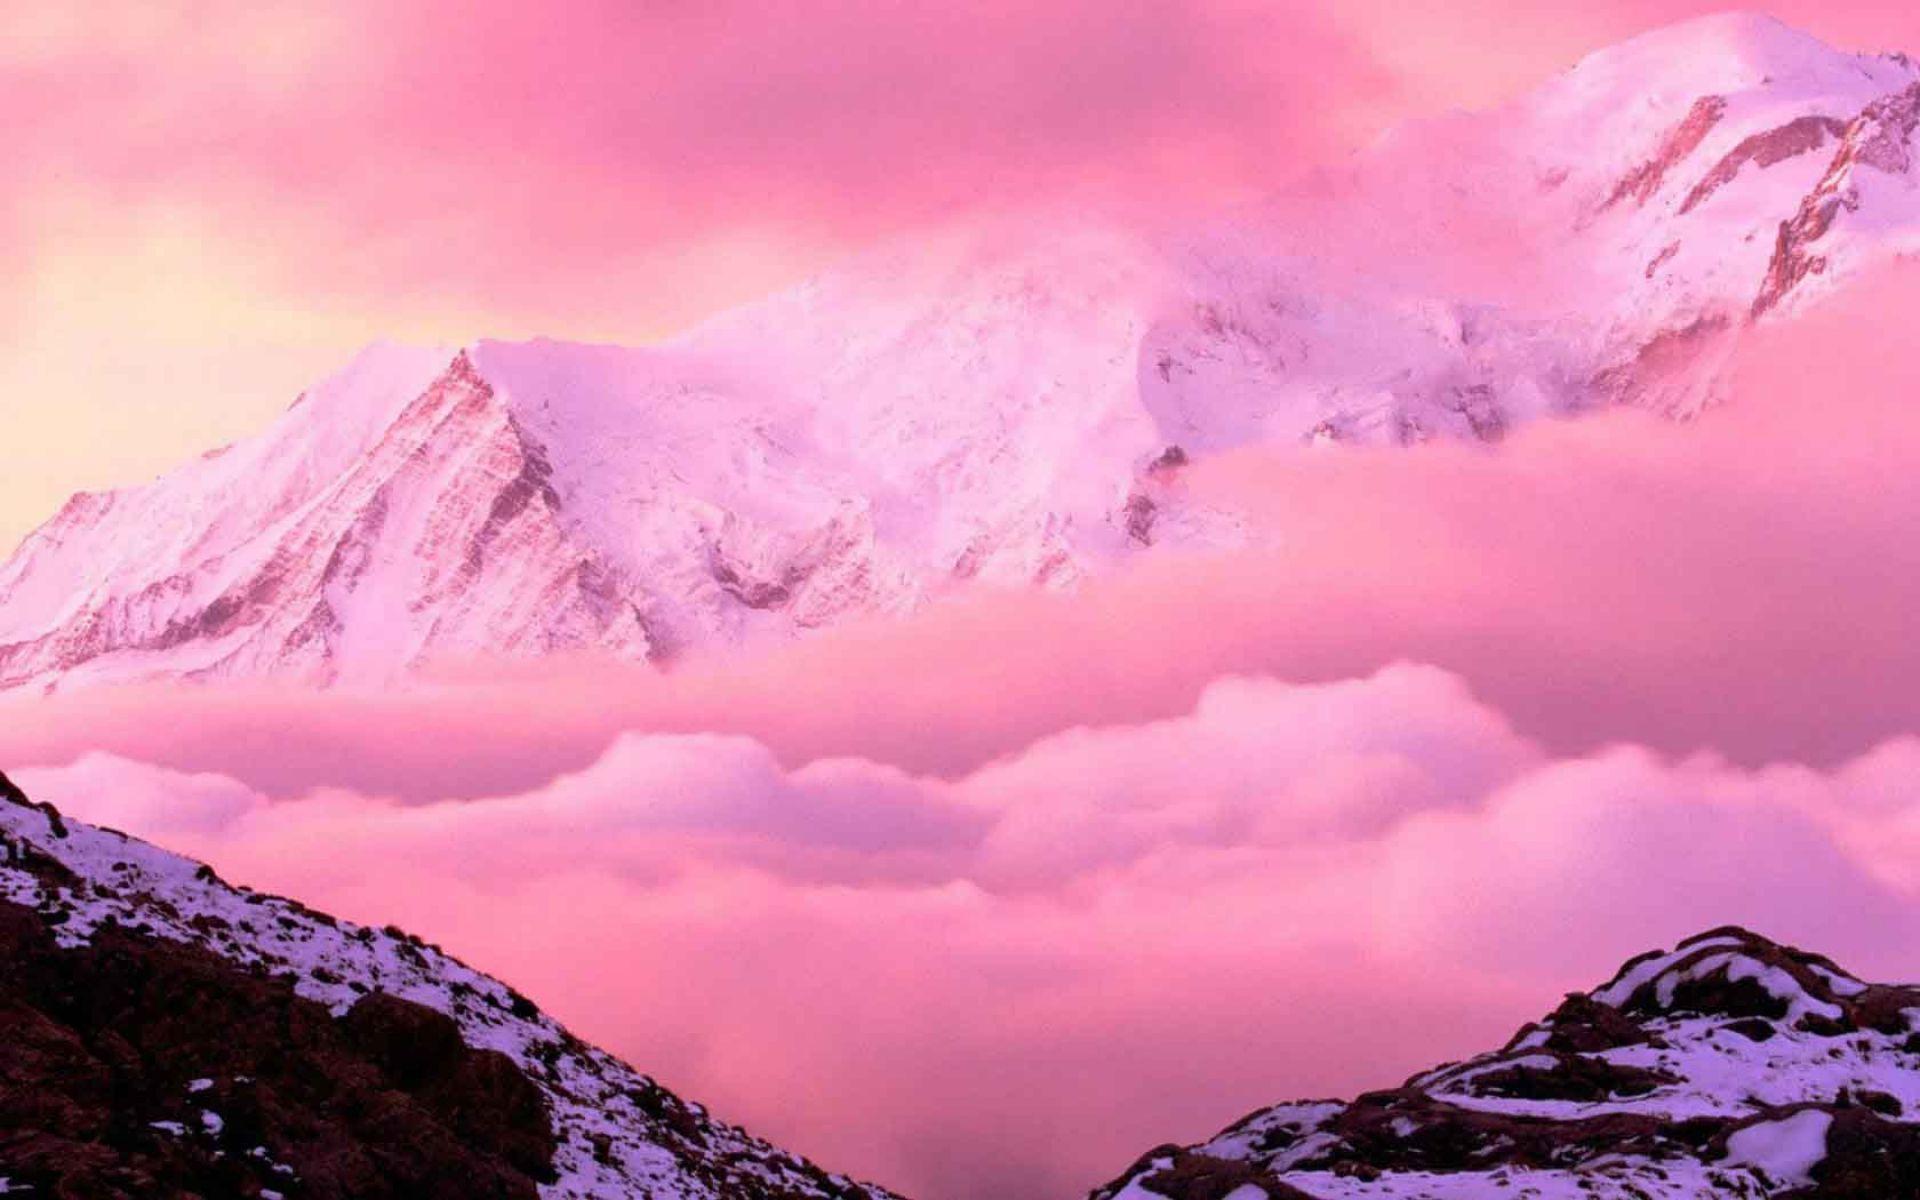 Fondos De Pantalla Rosa: 4K Pink Wallpapers High Quality